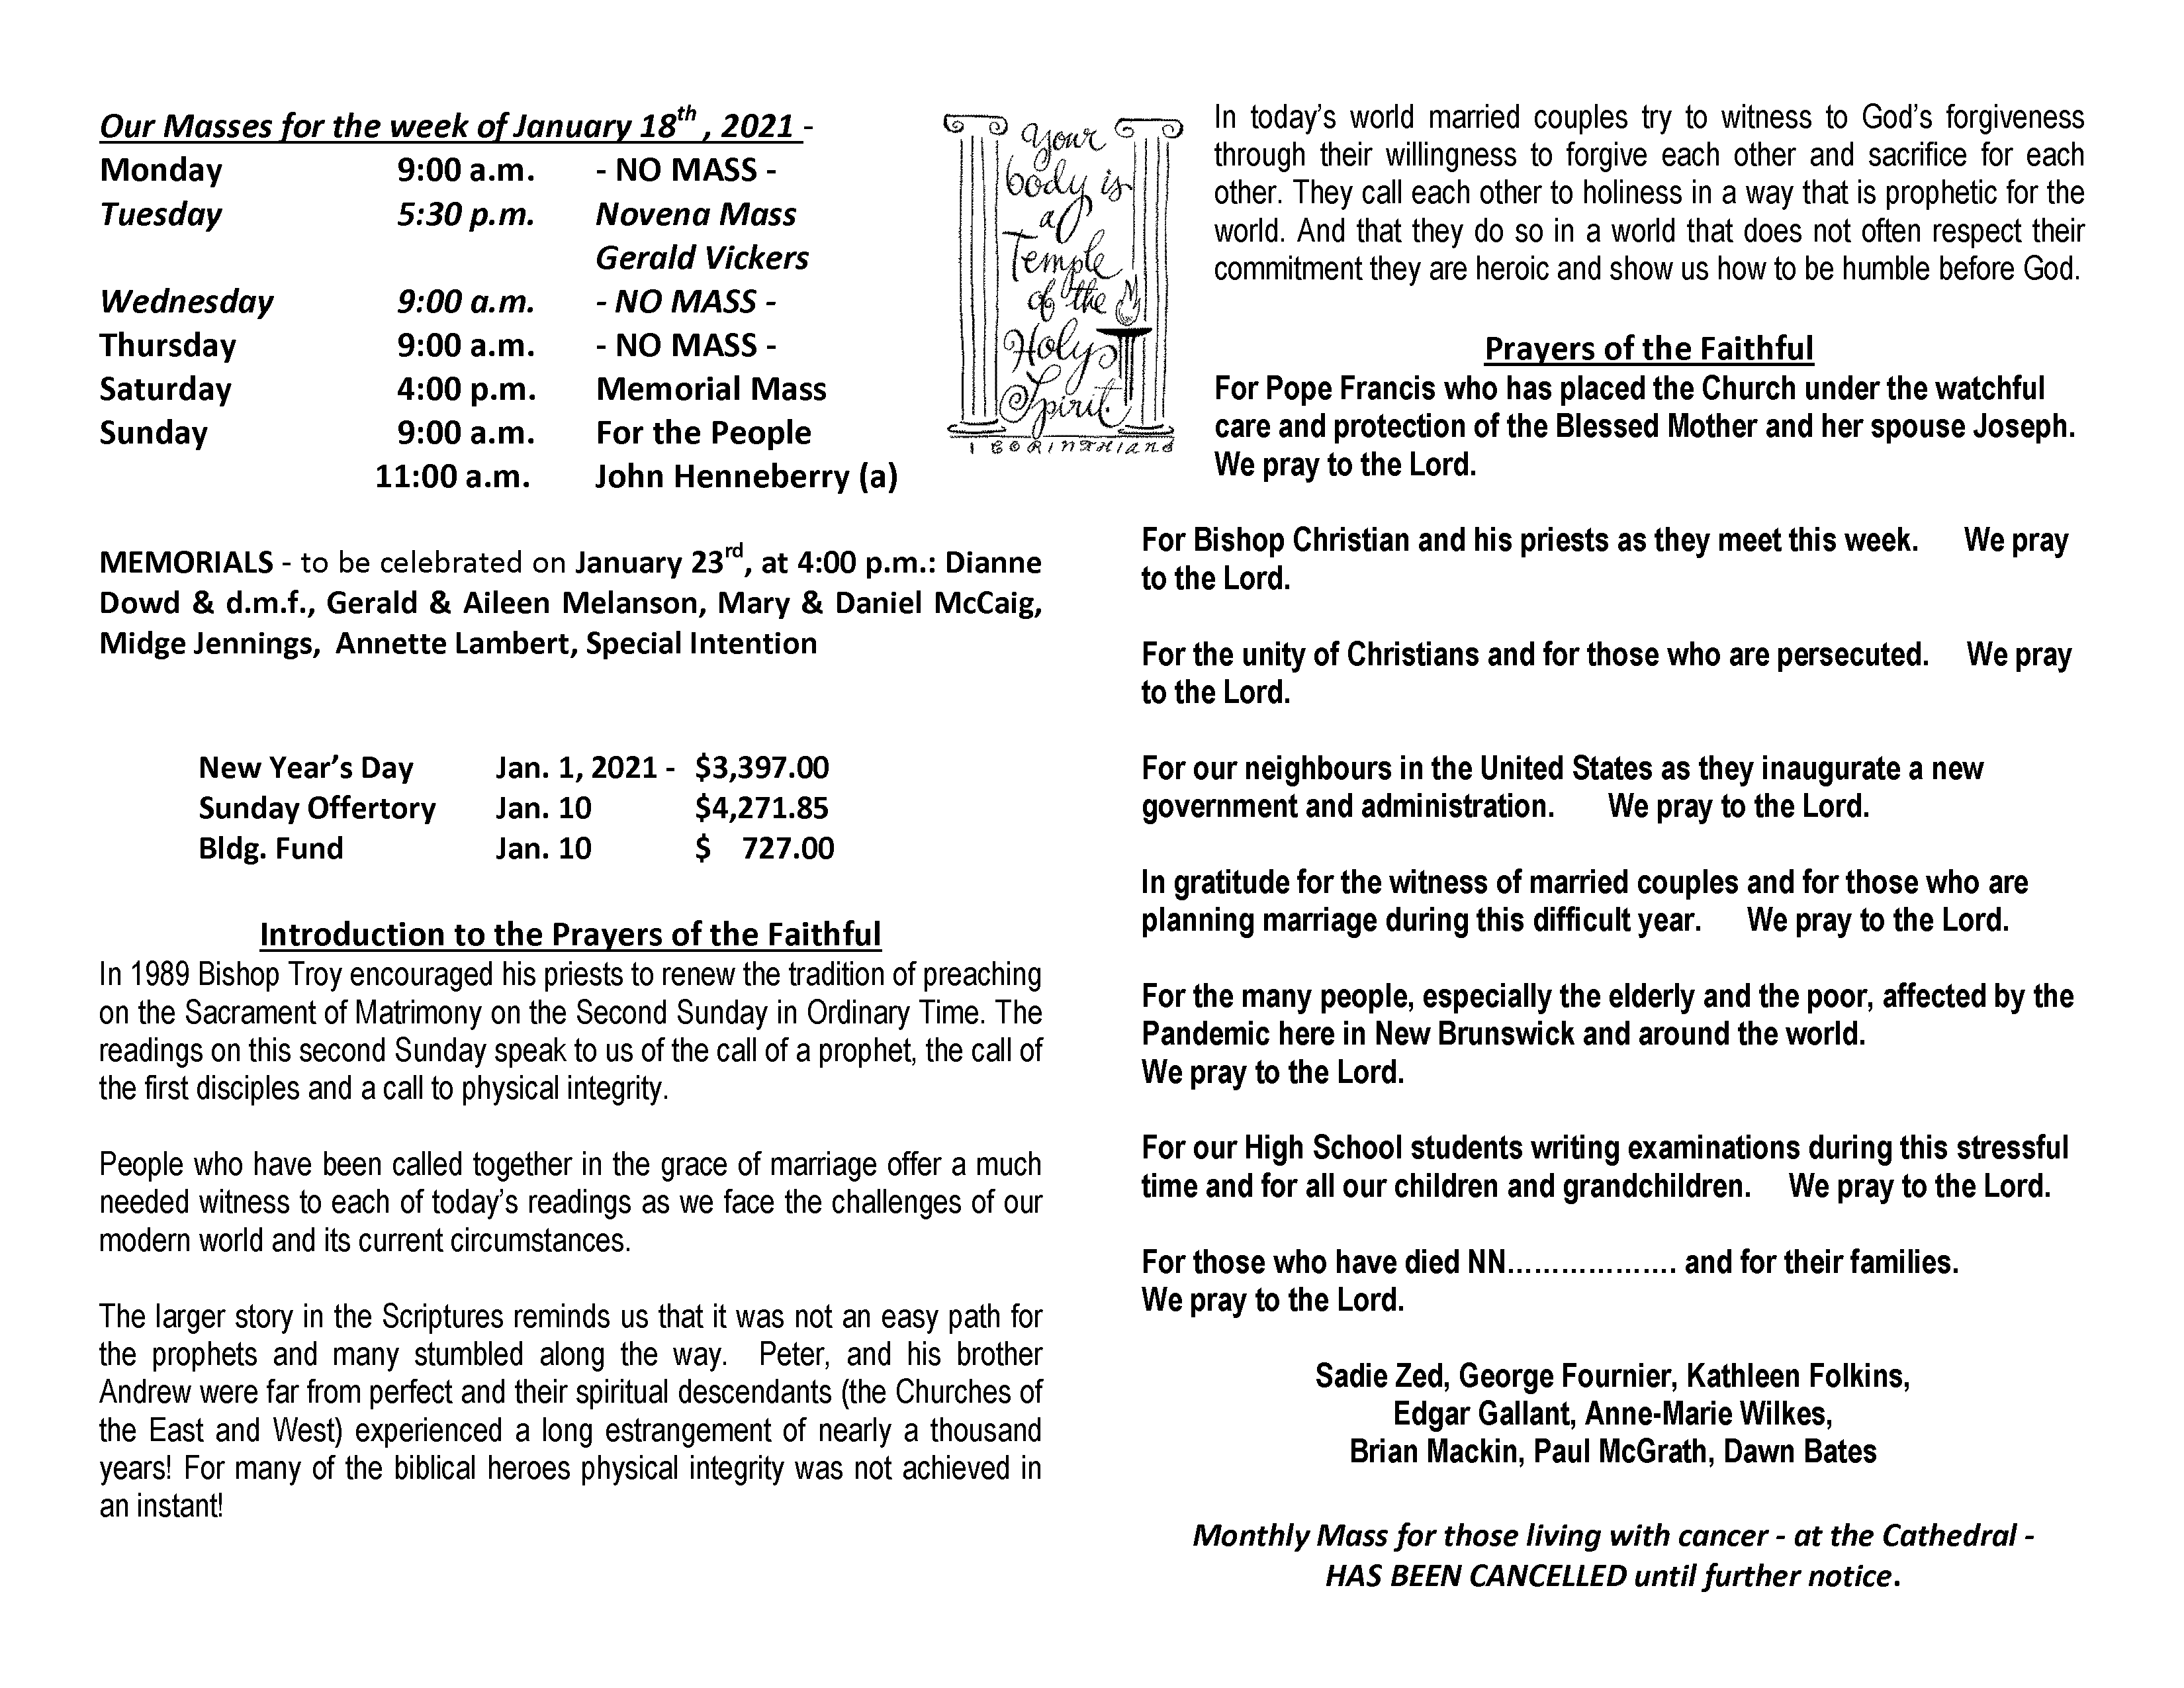 01-17-21